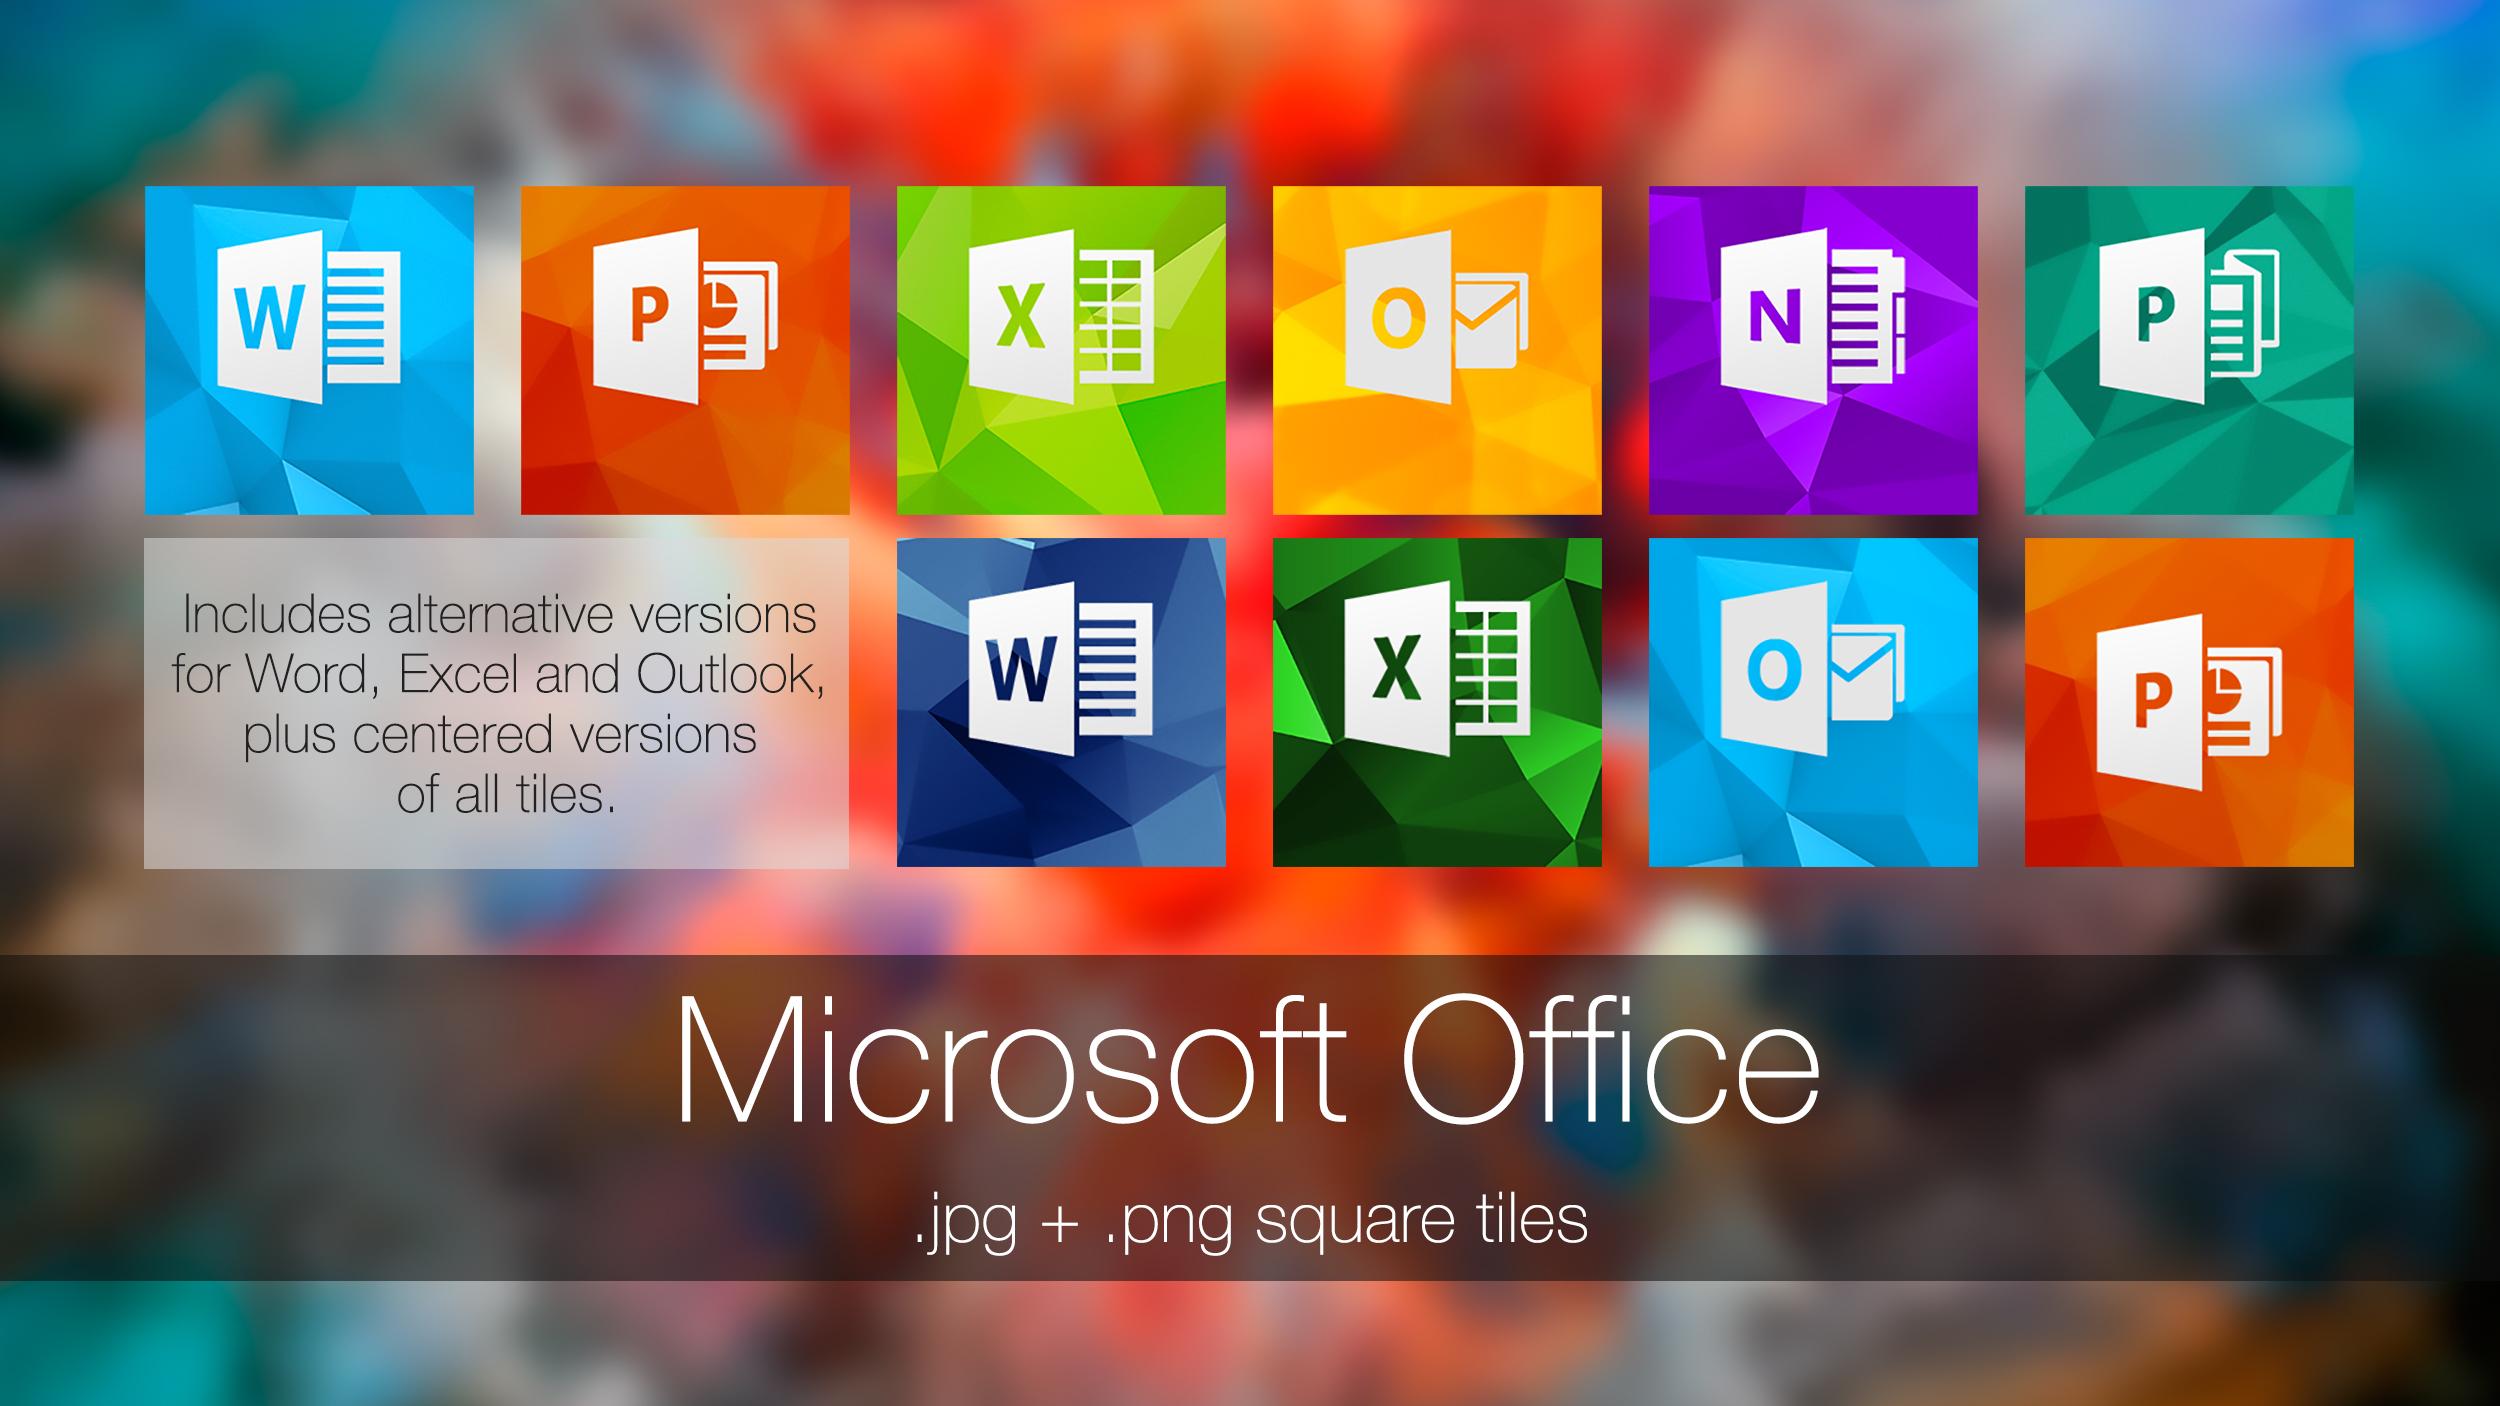 Microsoft Office (square tiles)